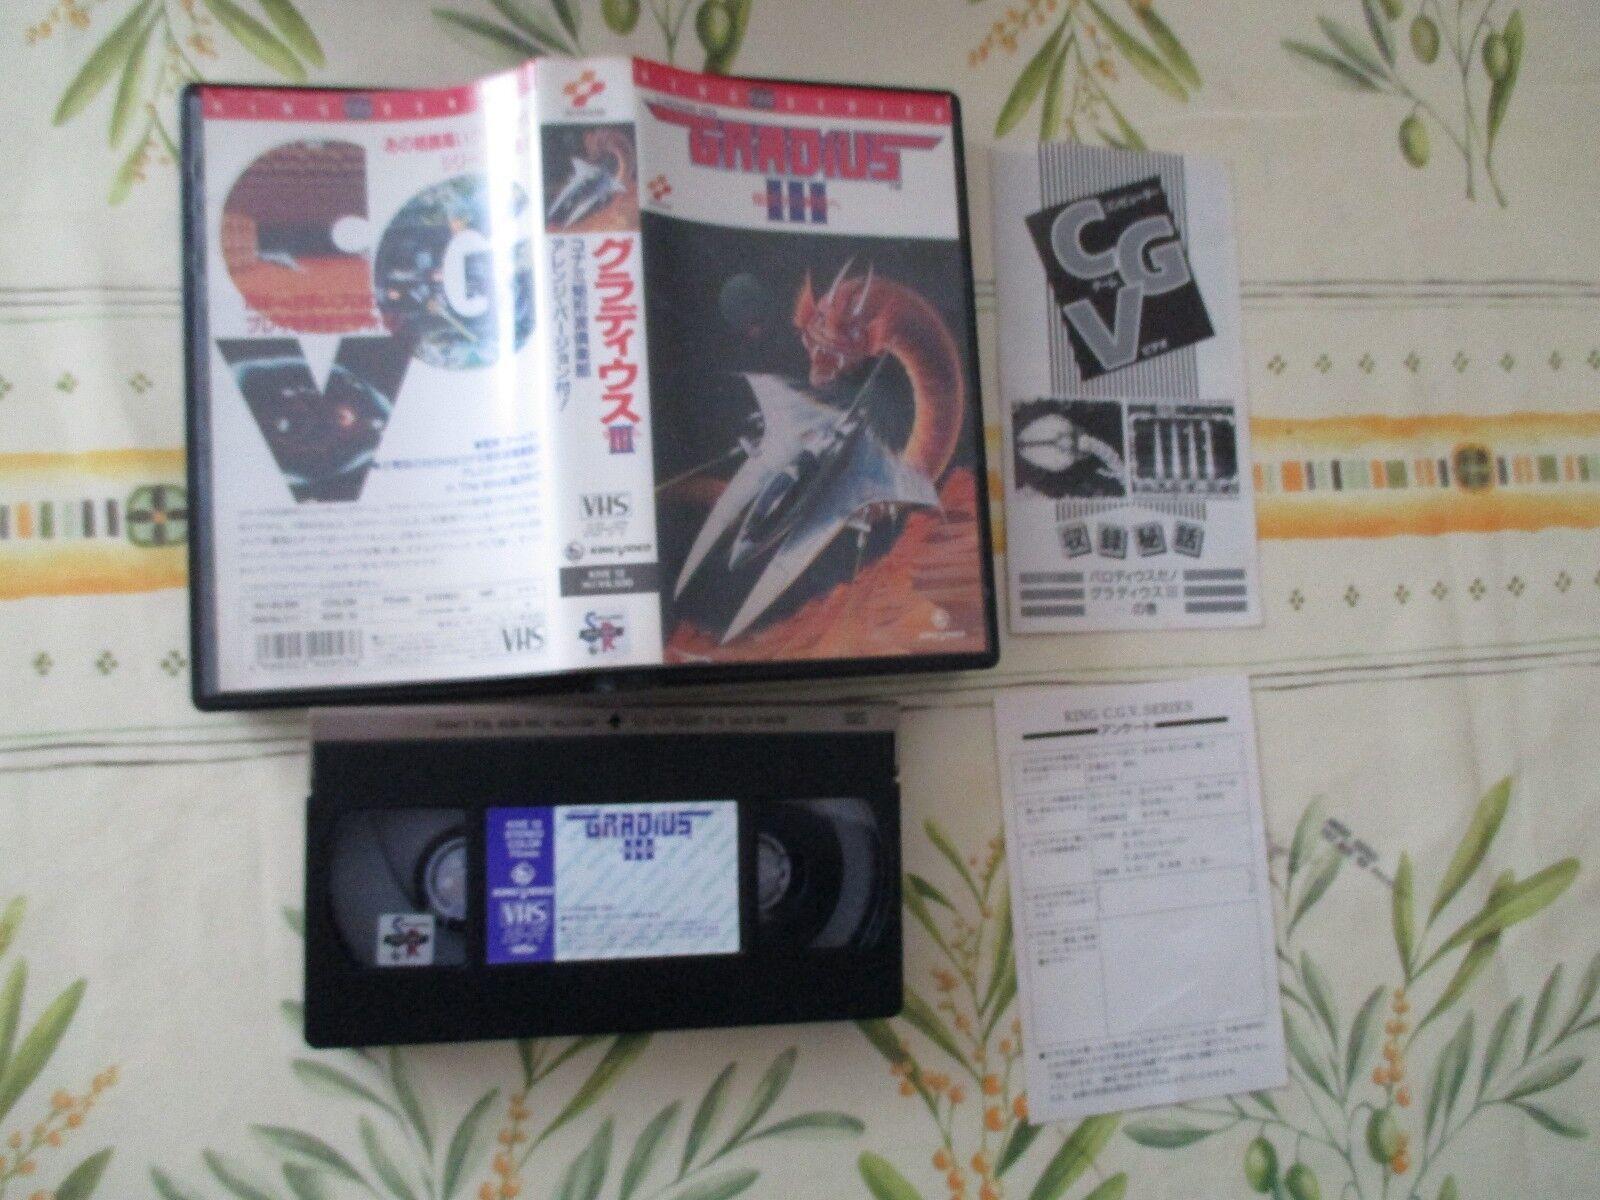 >> GRADIUS III 3 KONAMI SHOOTING ARCADE OFFICIAL OFFICIAL OFFICIAL VHS TAPE KING VIDEO! << 4bbbde